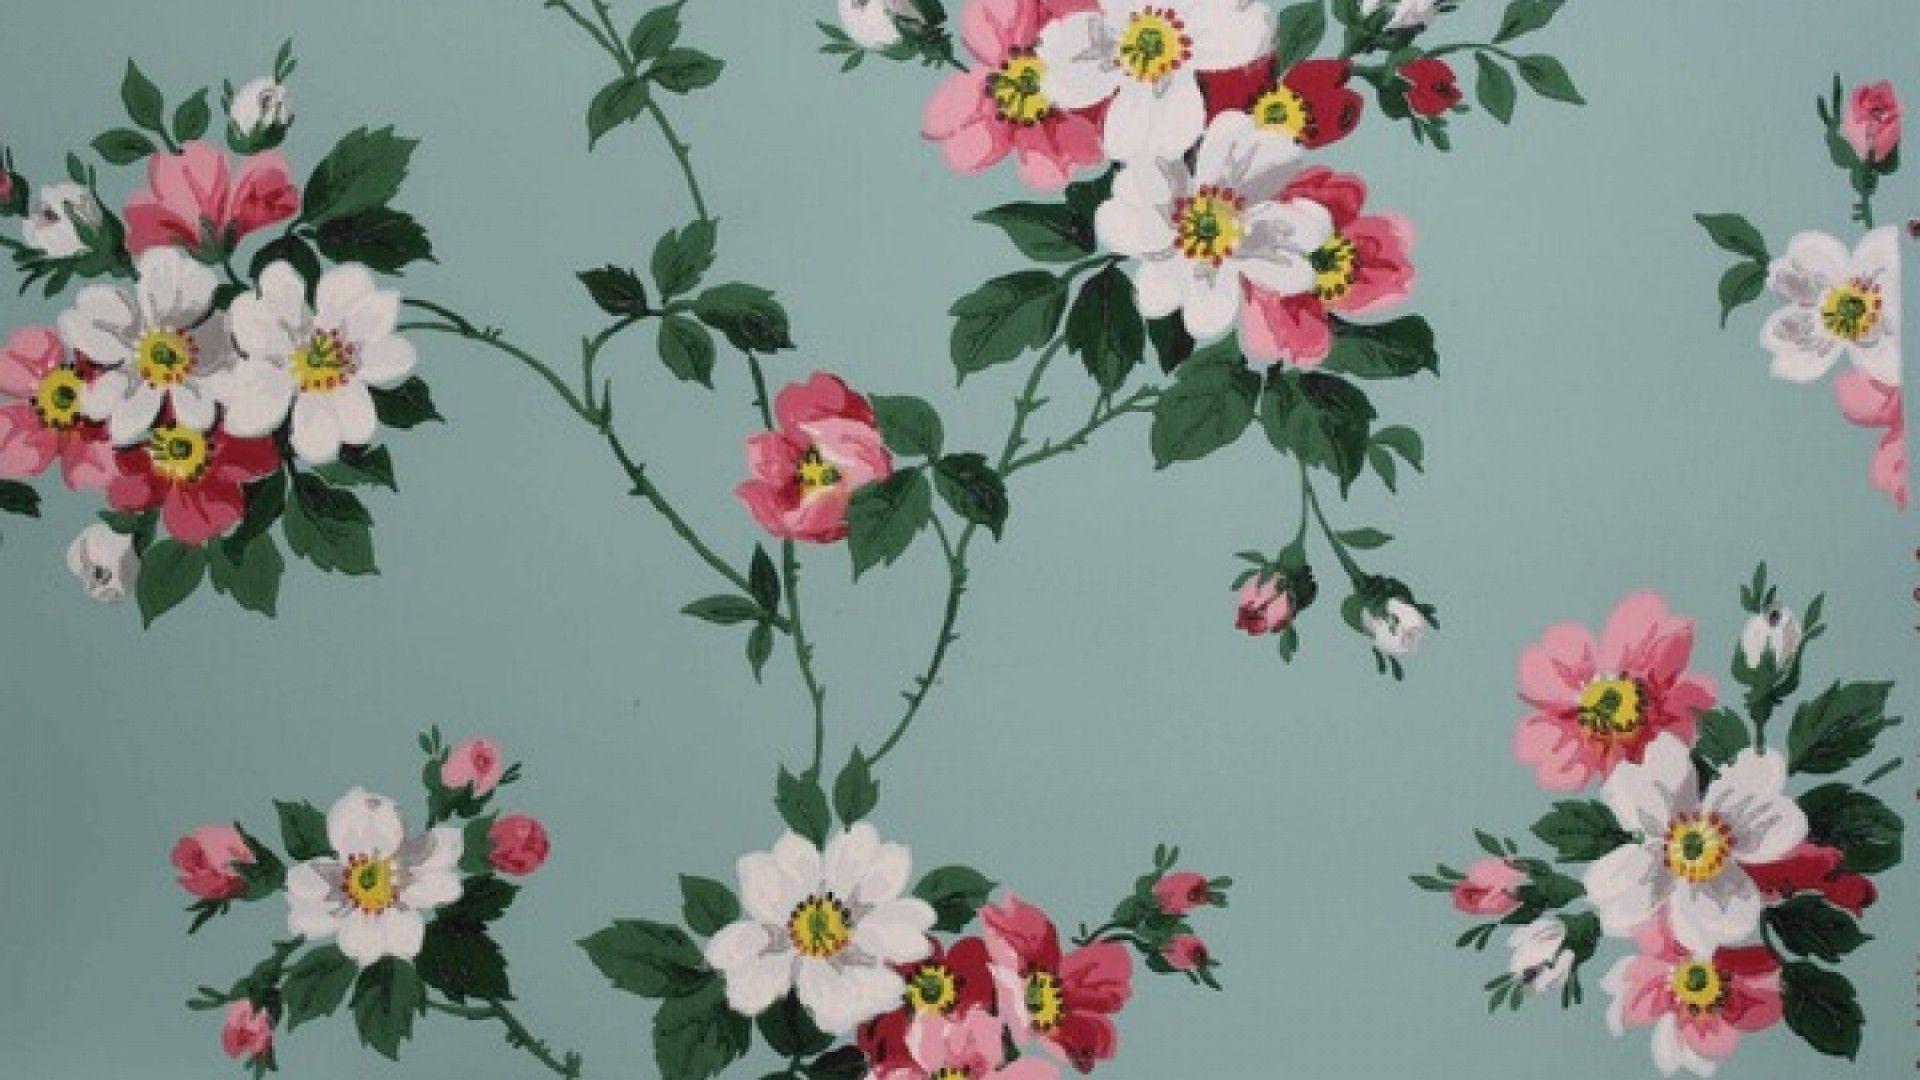 Vintage Floral Computer Wallpapers Top Free Vintage Floral